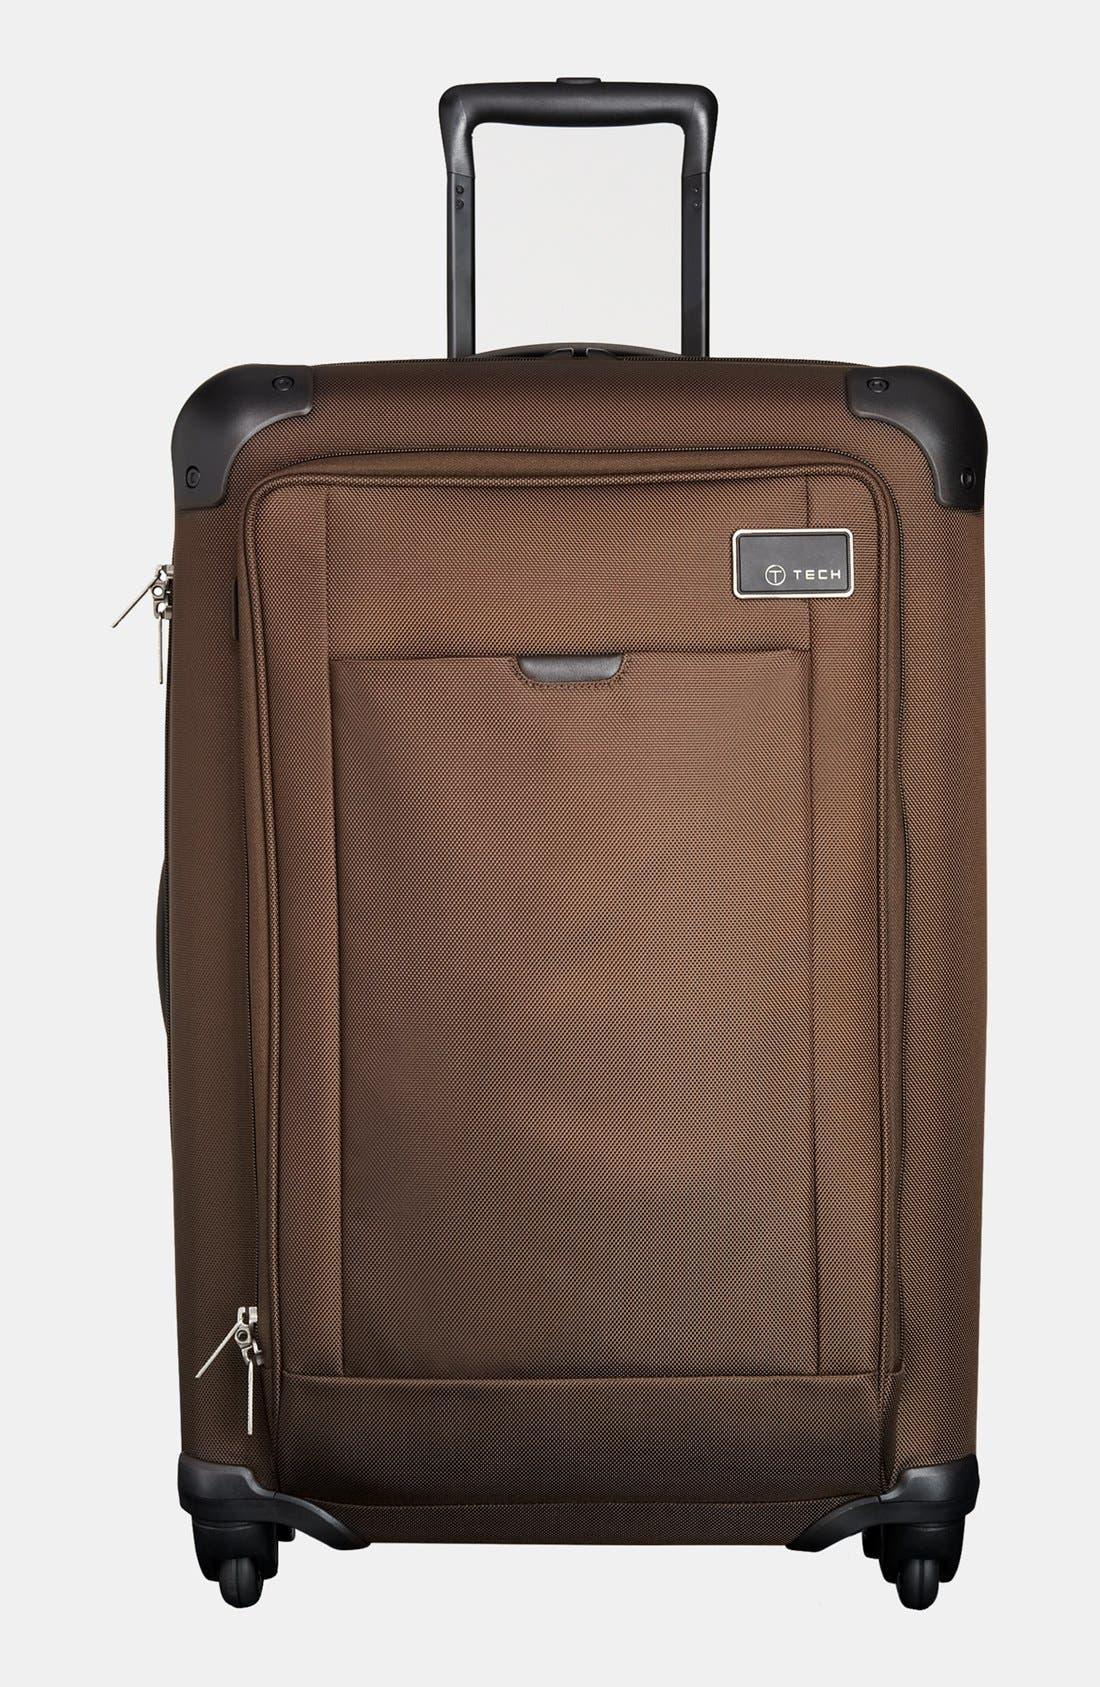 Alternate Image 1 Selected - Tumi 'T-Tech Network' Lightweight 4-Wheeled Medium Trip Packing Case